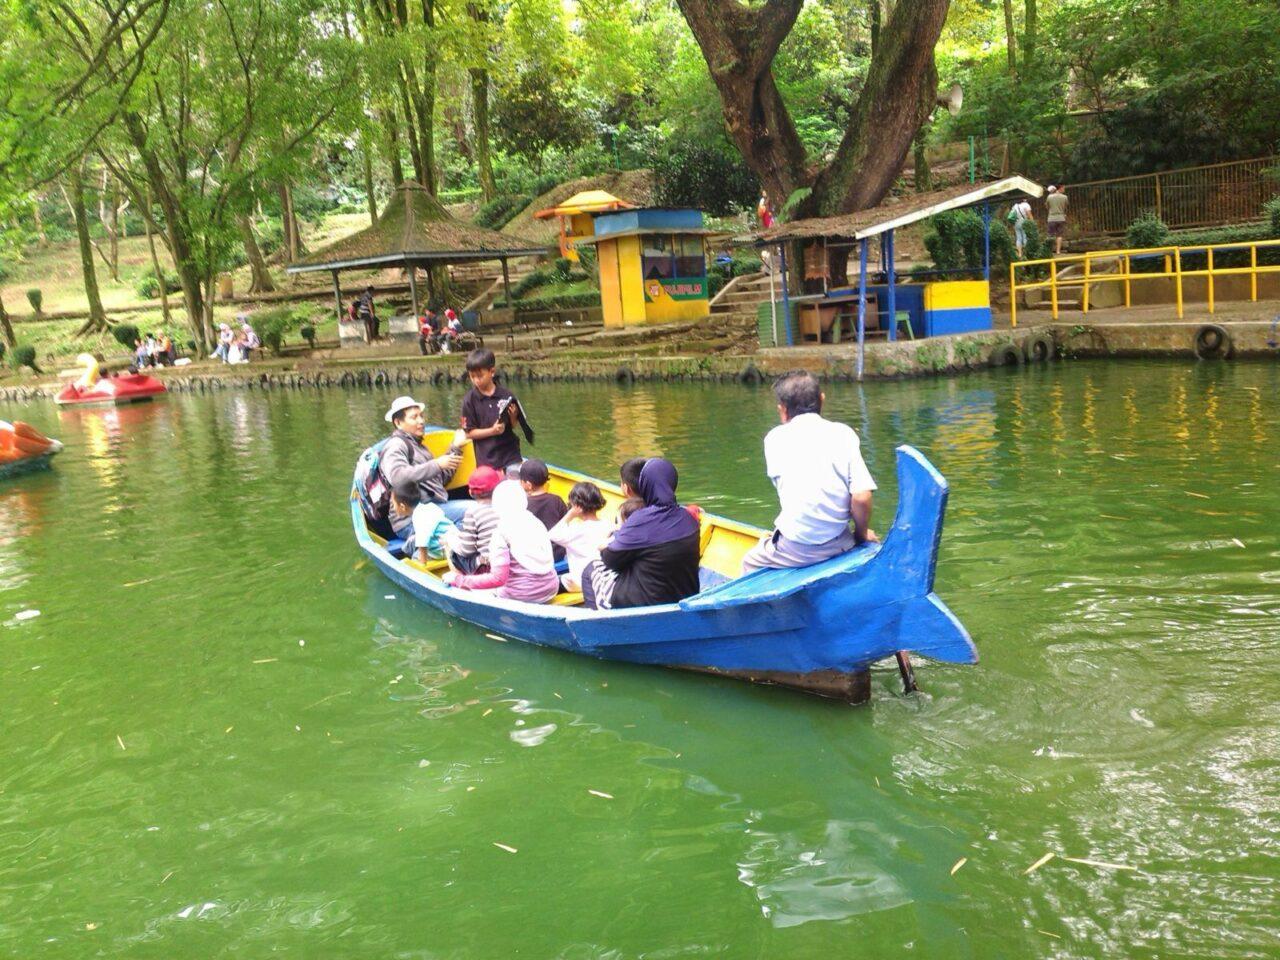 wahana perahu kebun binatang bandung